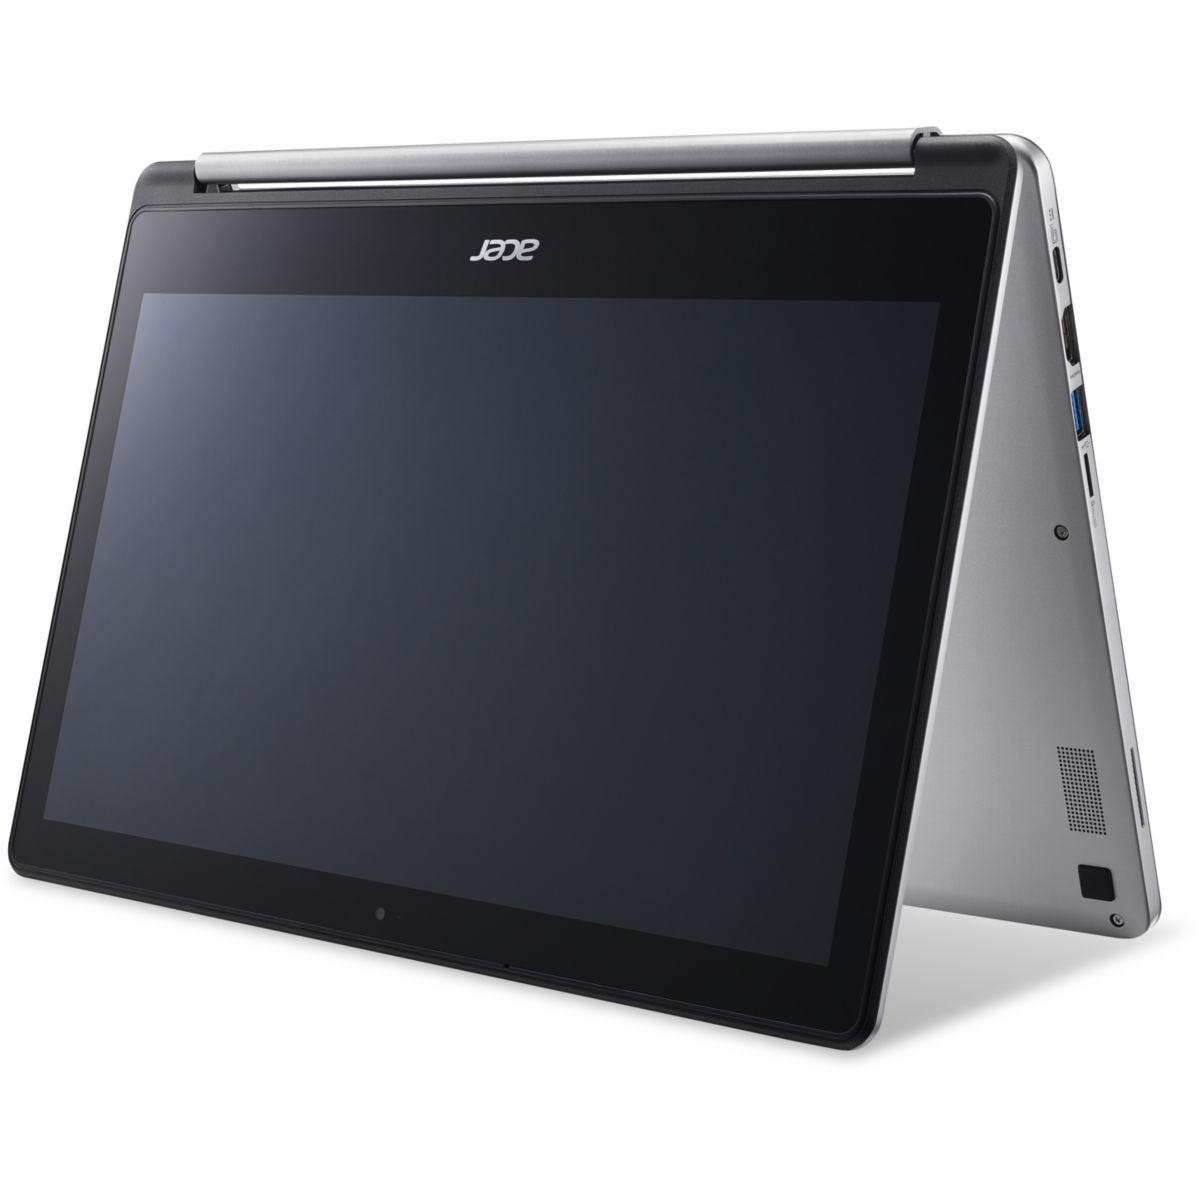 Chromebook acer chromebook cb5-312t-k2l7 (photo)